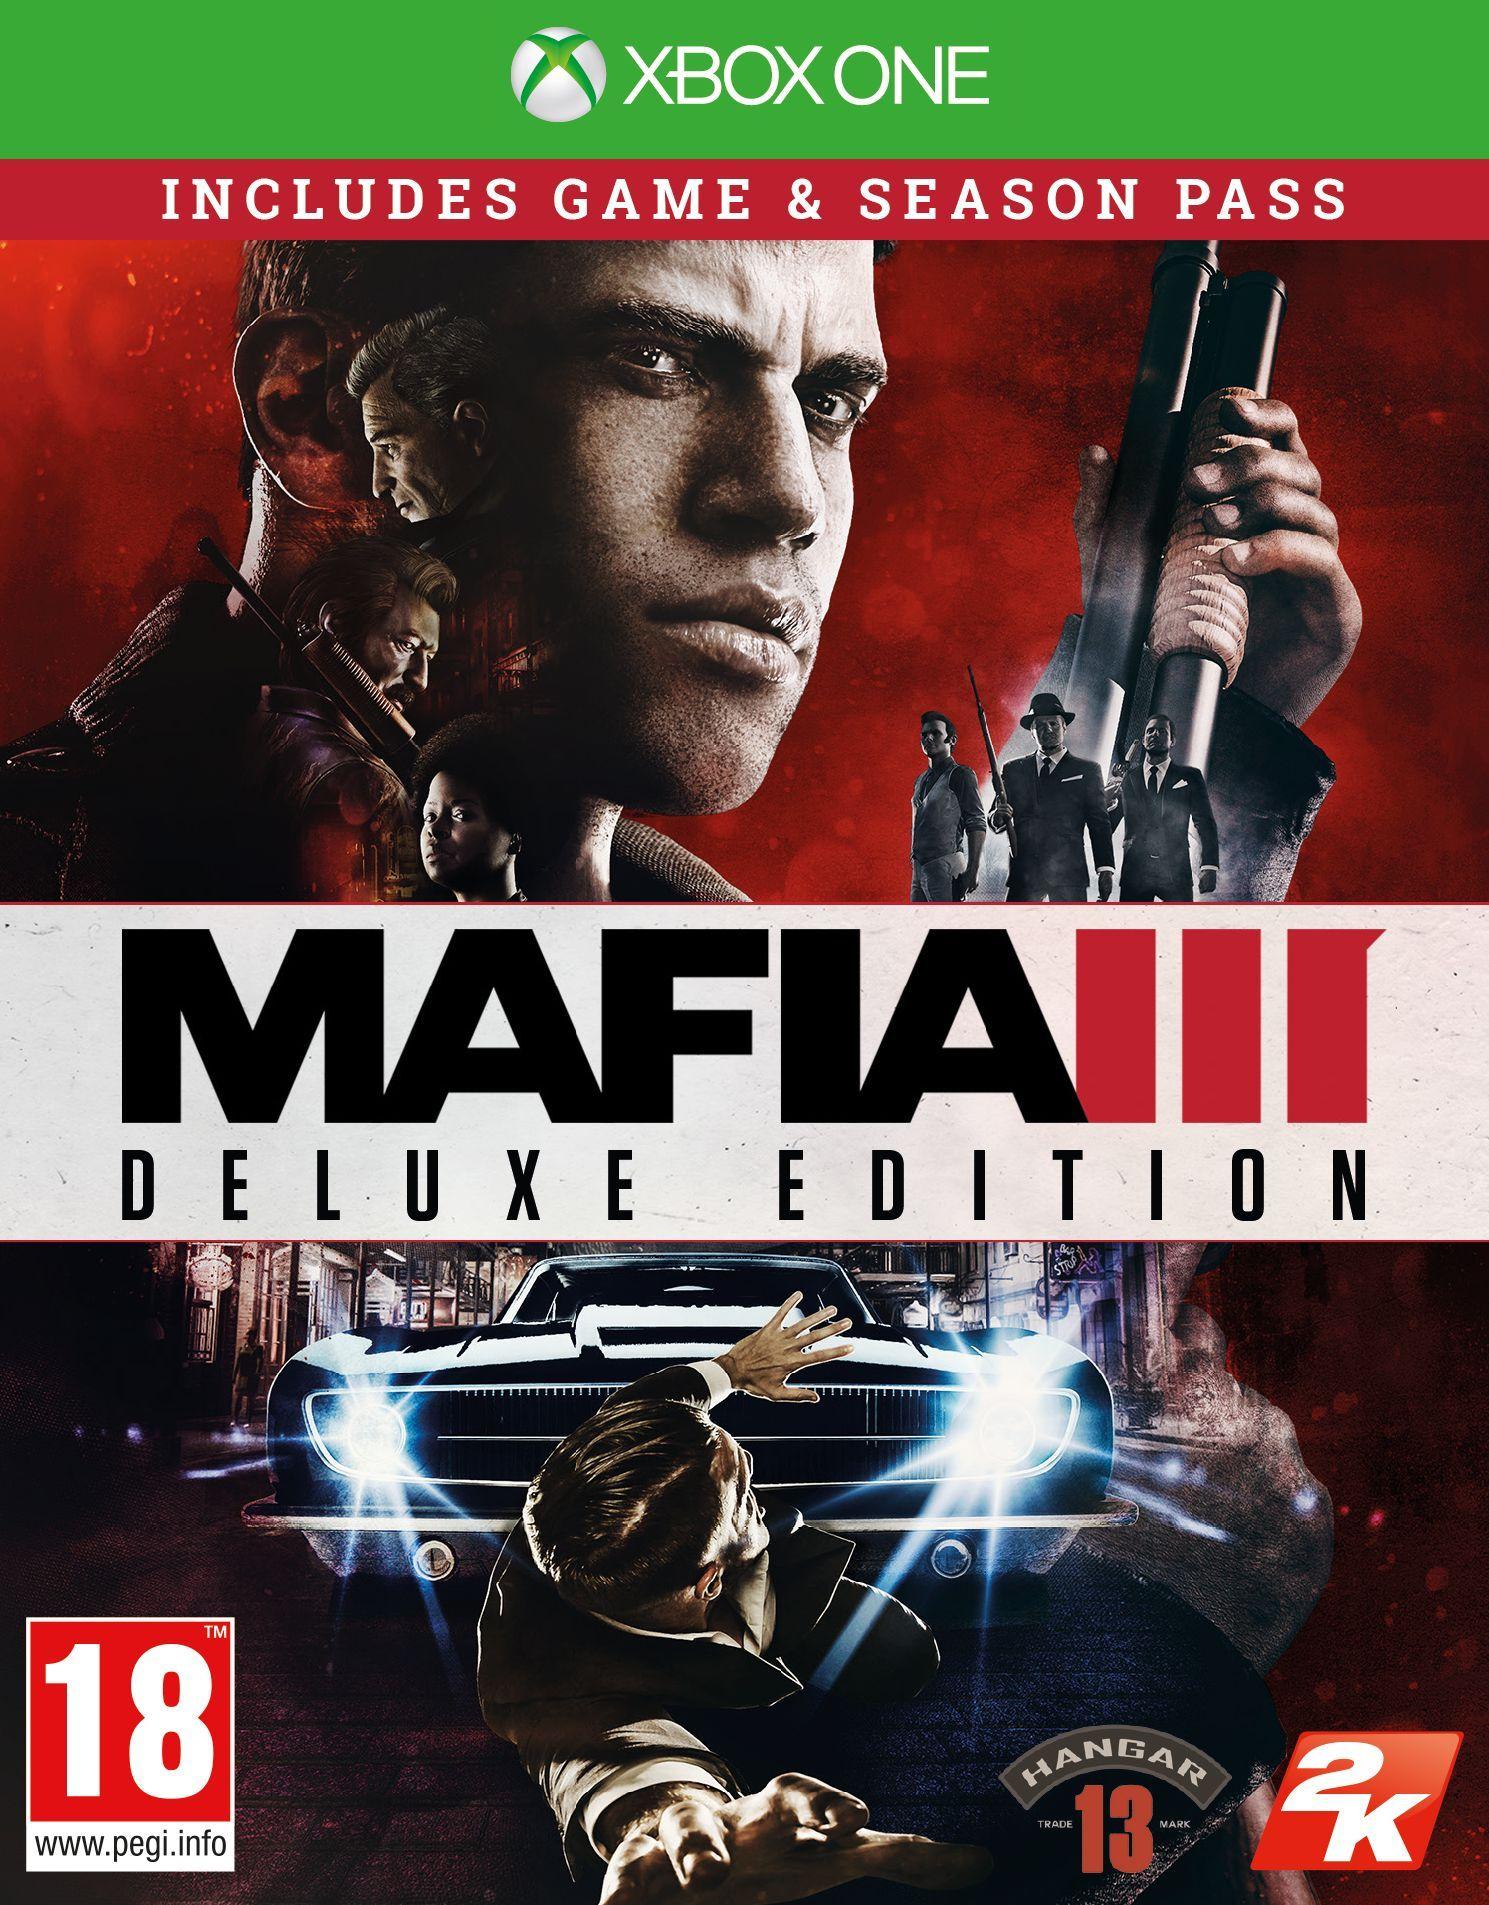 Mafia III Deluxe Edition (Xbox One) - 1